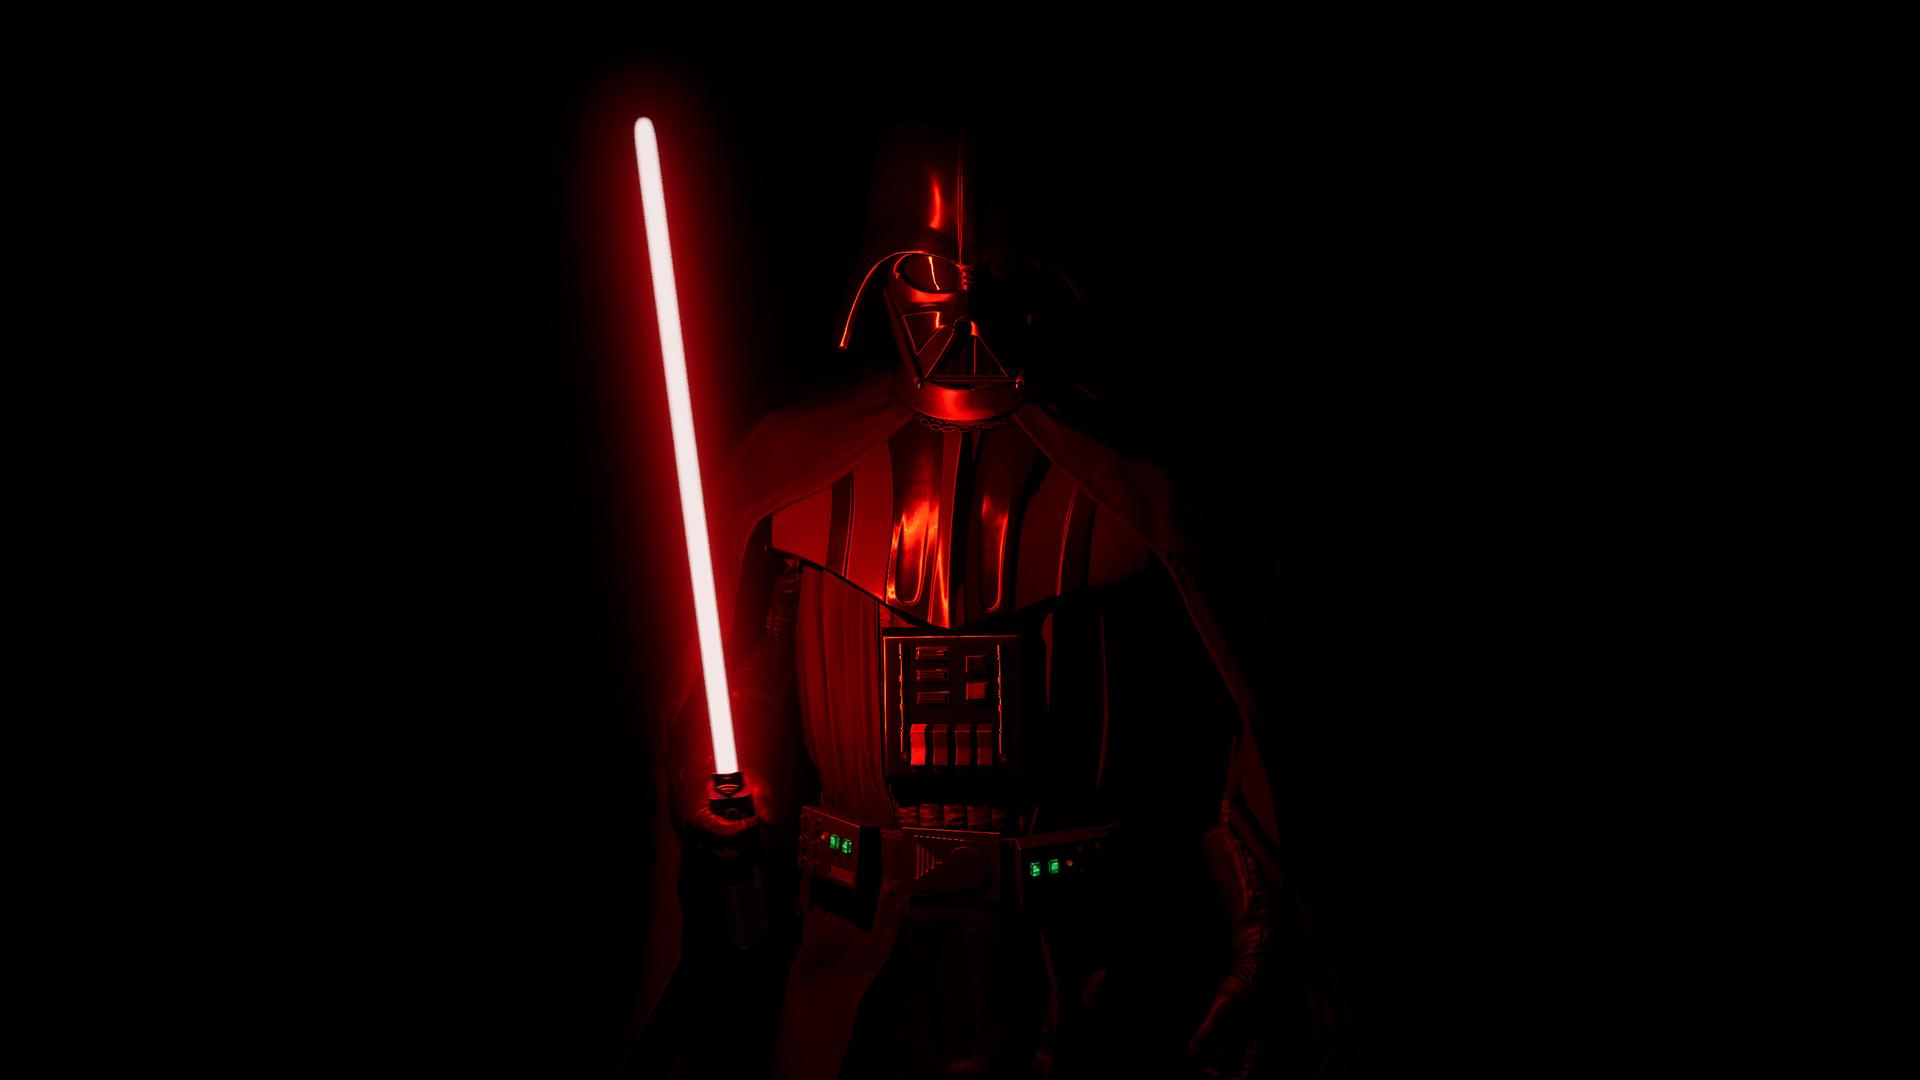 1920x1080 Darth Vader 5k 2019 Laptop Full HD 1080P HD 4k ...